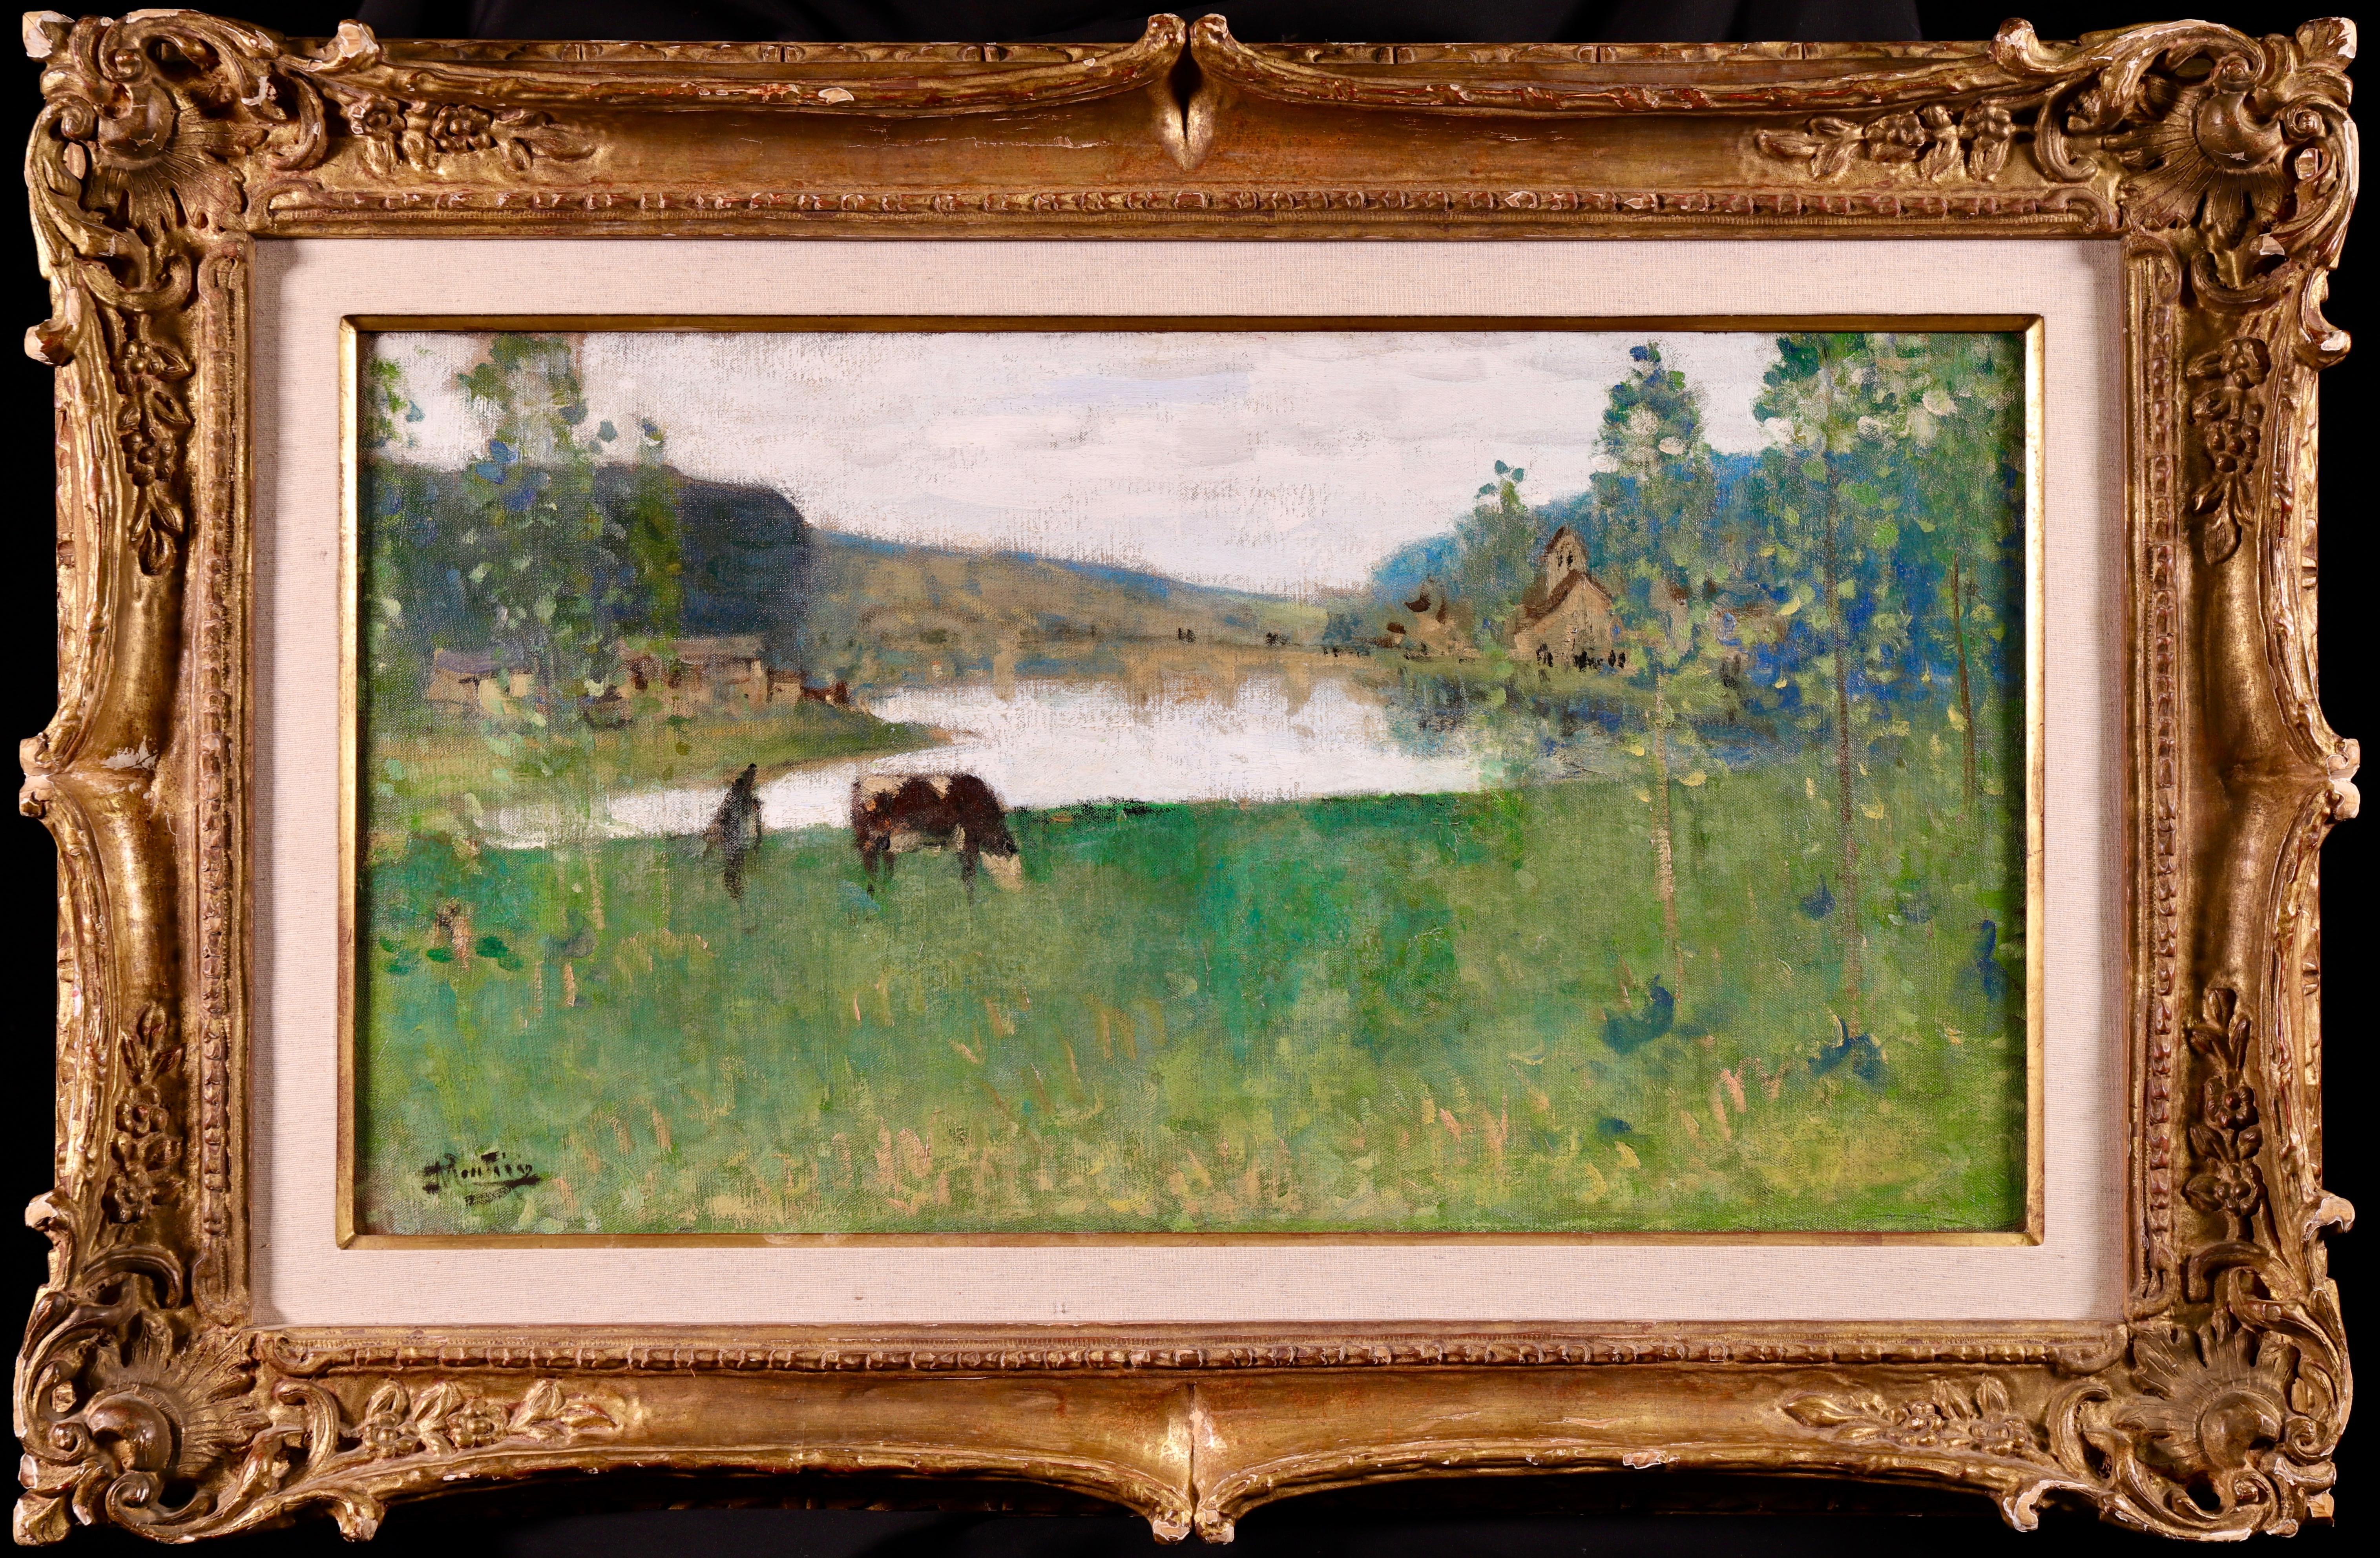 By the Lake - 19th Century Oil, Figure & Cow in Landscape by Pierre Montezin